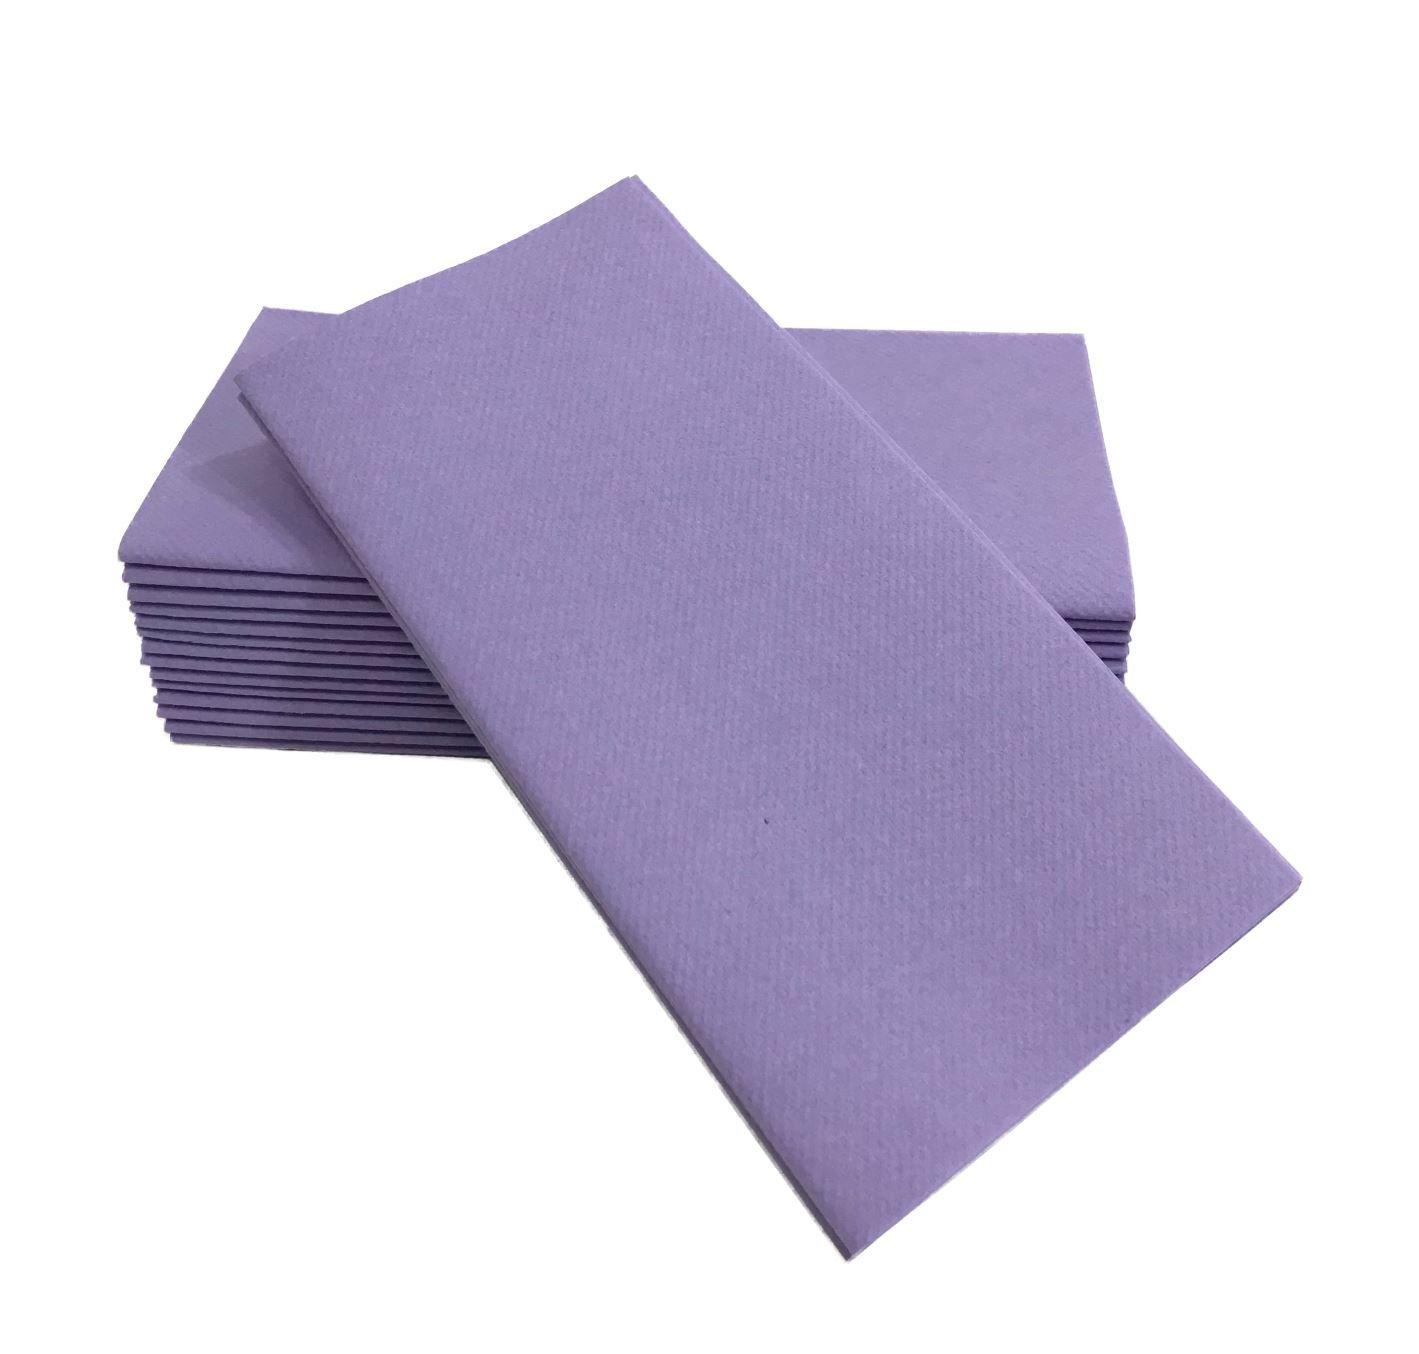 "Elina Home 16""x16"" Decorative Home Disposable Dinner Napkins | Linen Cloth Napkin Like Paper | Cocktail Wedding Party | (Lavender, 100)"